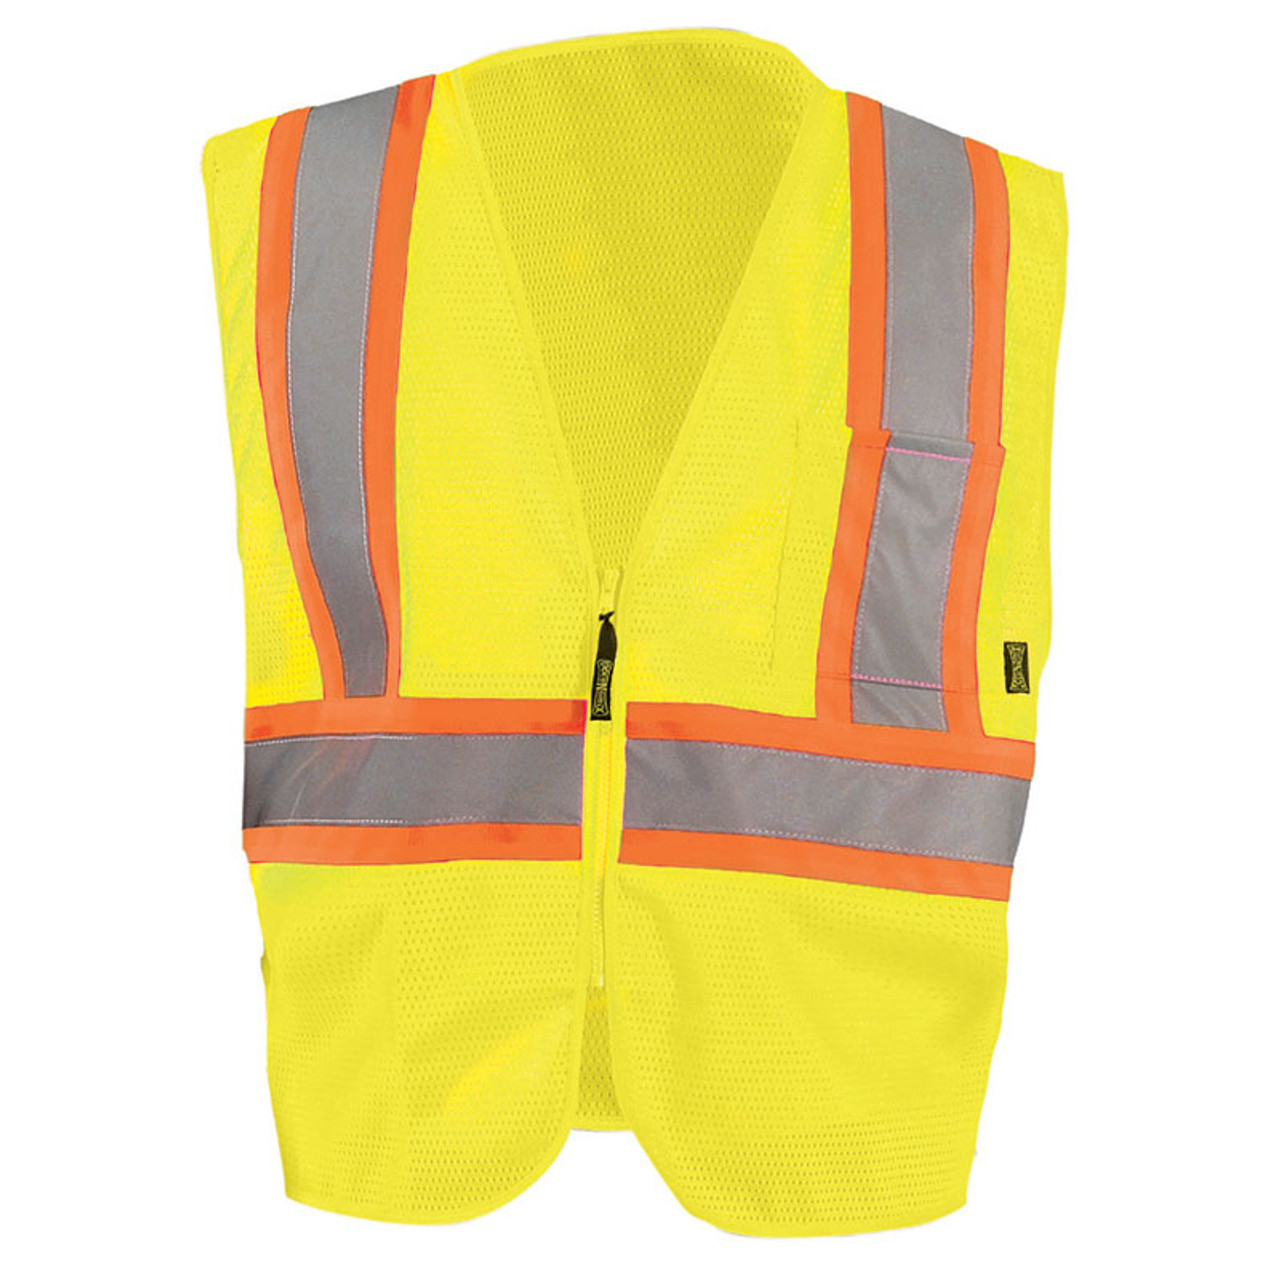 802699760ec Occunomix Class 2 Hi Vis Mesh Two-Tone Economy Safety Vest ECO-IM2TZ Yellow